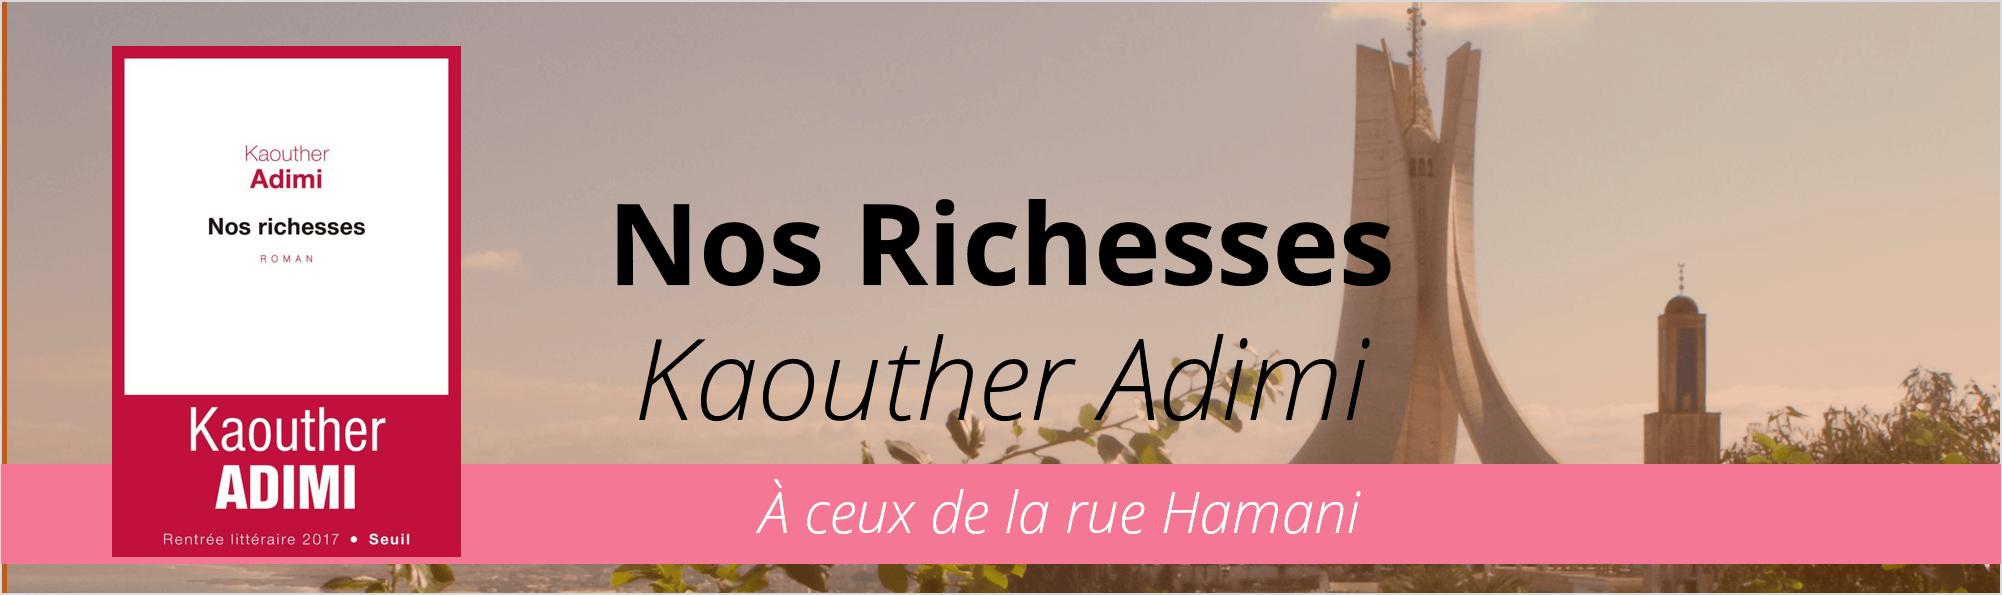 Le Seuil, Nos richesses